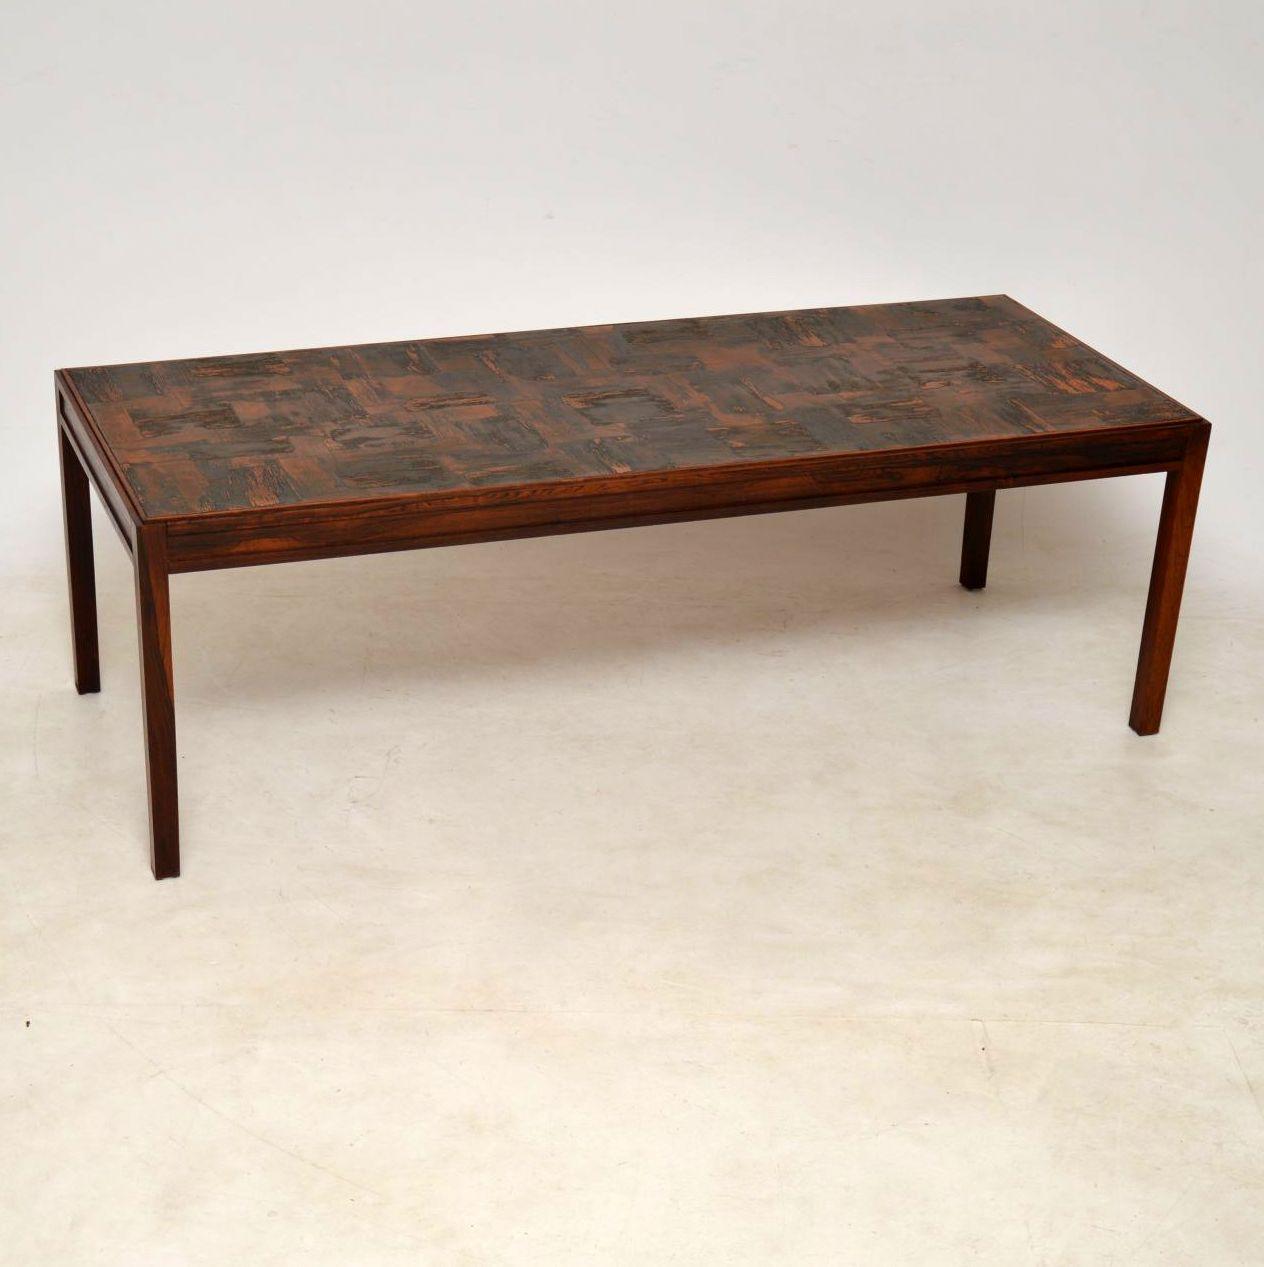 Fabulous 1960S Vintage Danish Wood Copper Coffee Table Evergreenethics Interior Chair Design Evergreenethicsorg